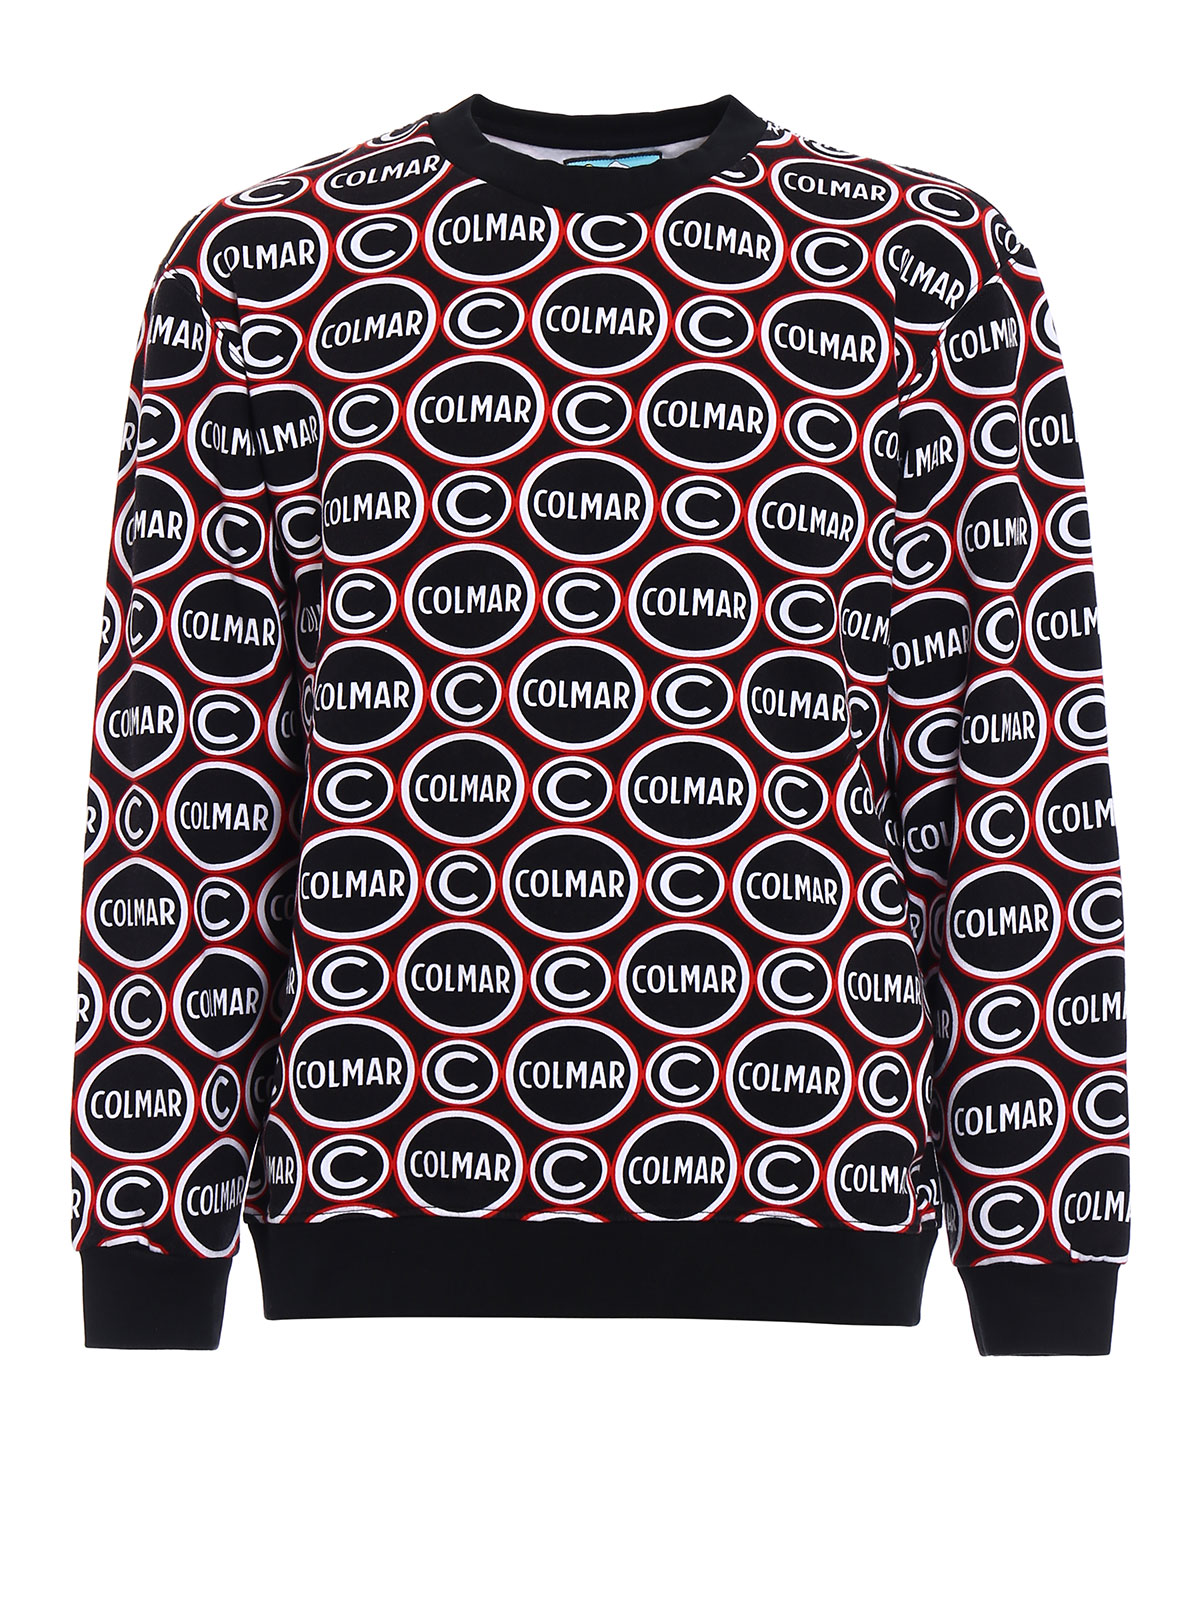 8674e48712c colmar-originals-sweatshirts--sweaters-get-all-over-logo-print-sweatshirt-00000118221f00s011.jpg